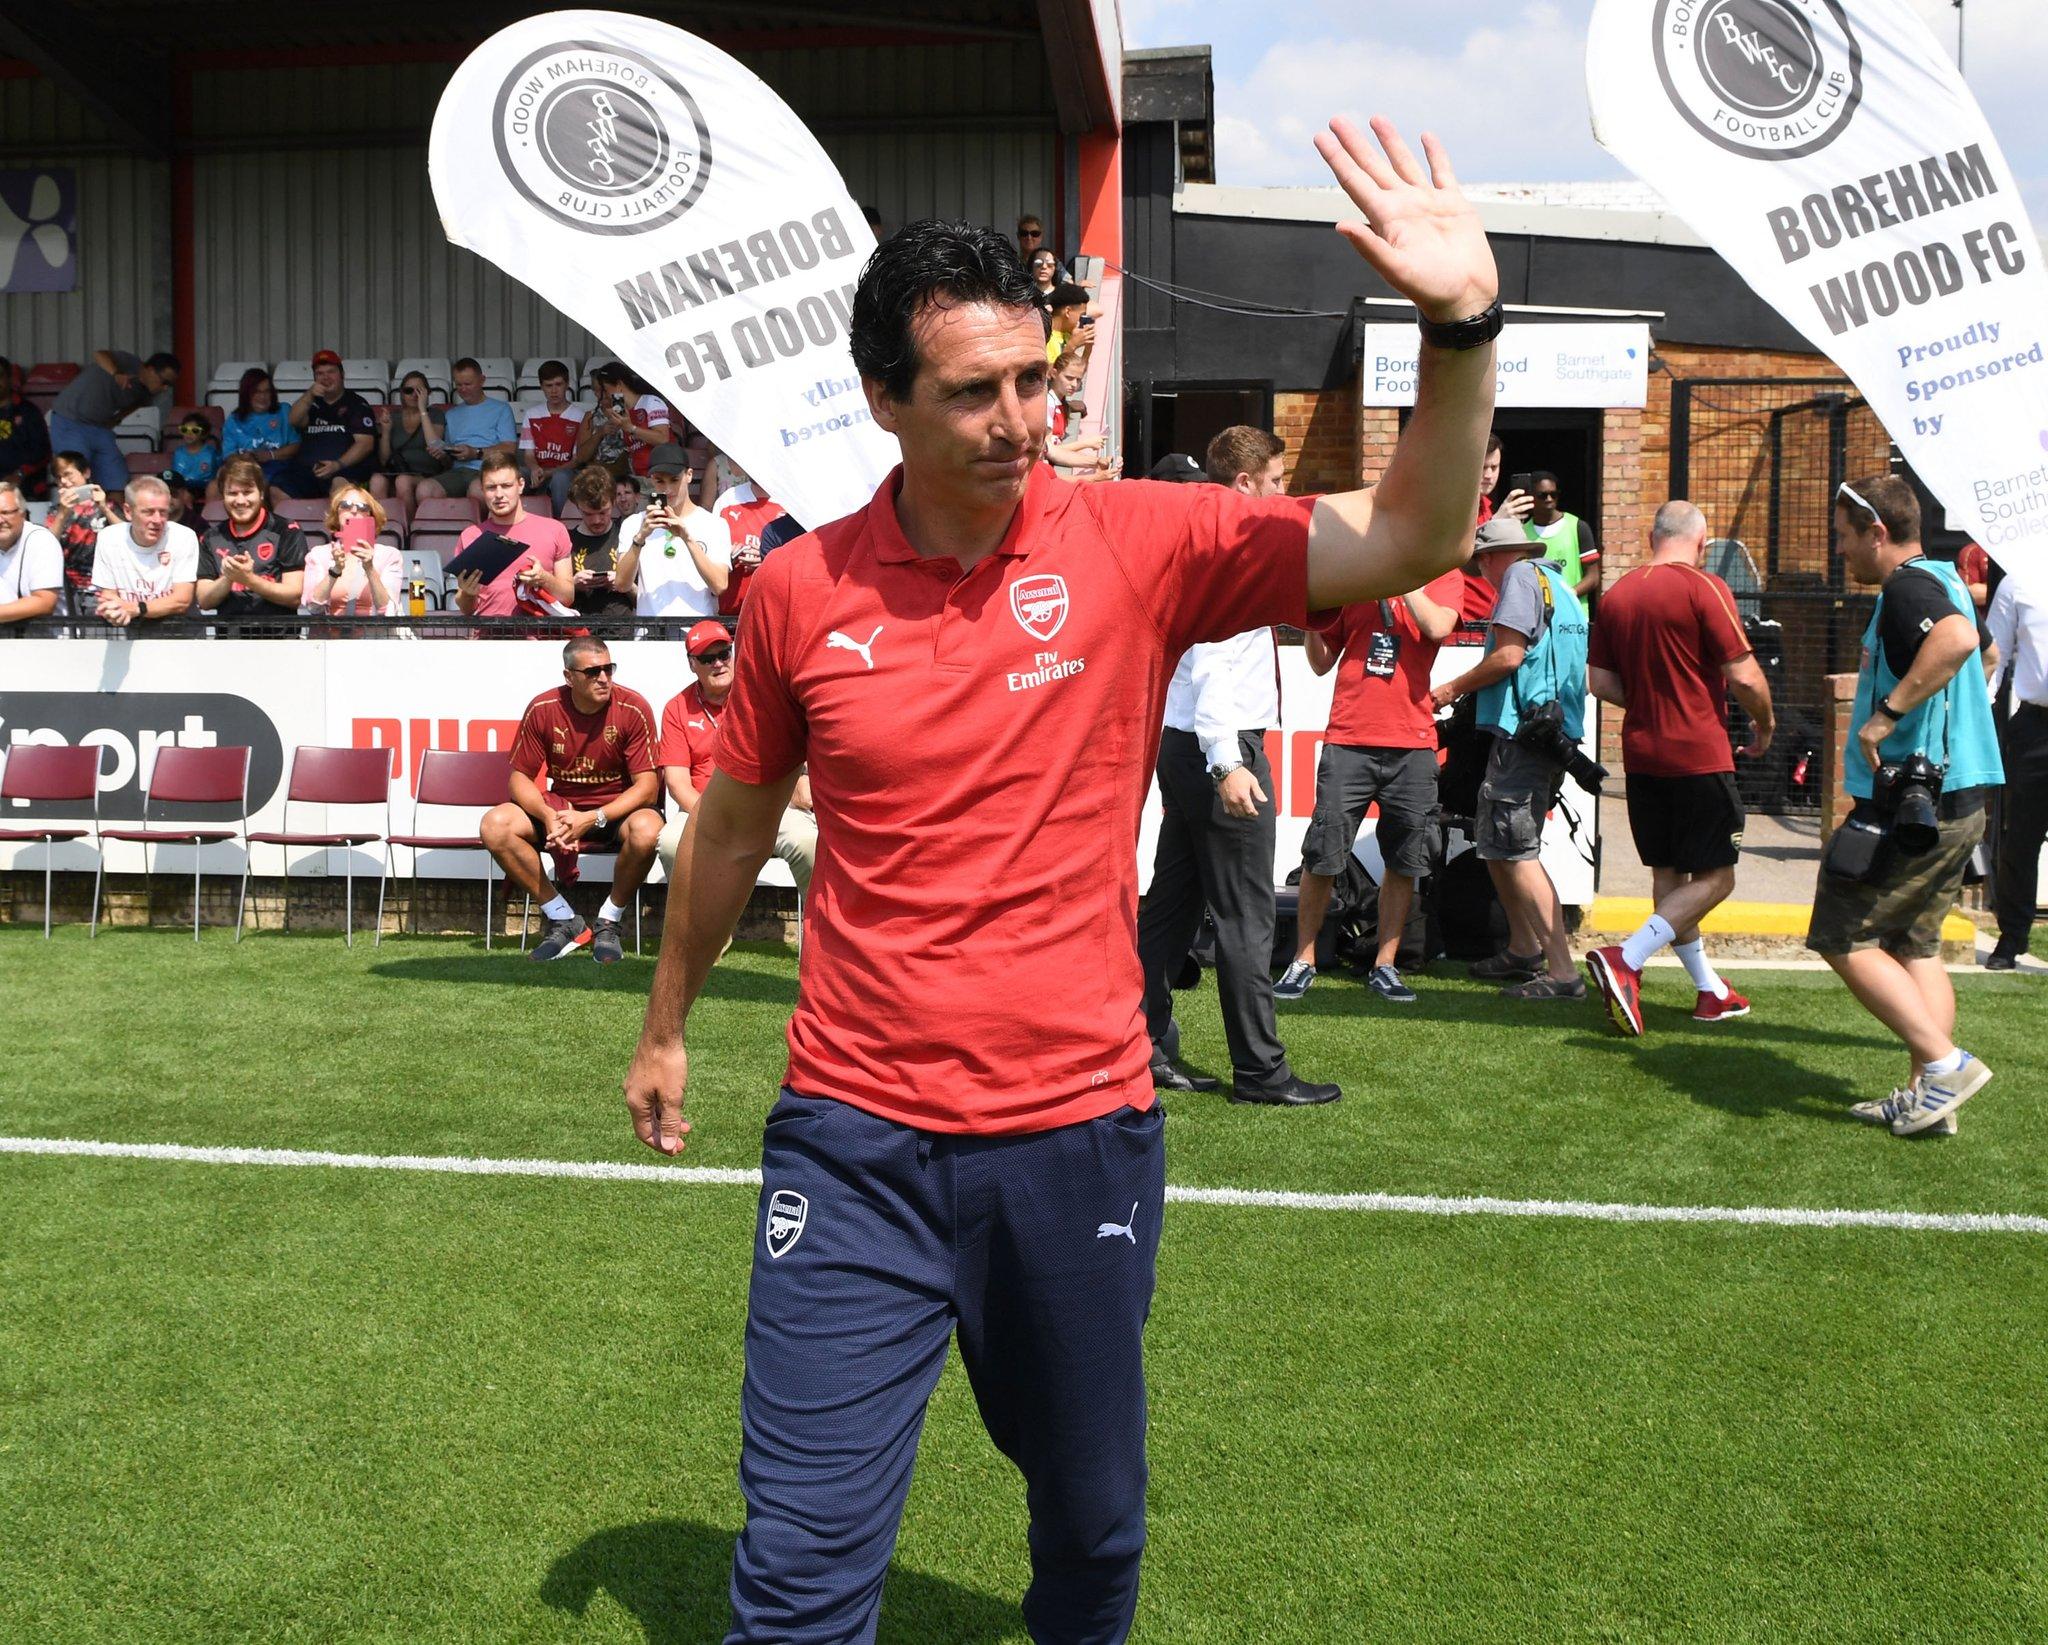 Unai Emery At Boreham Wood Match